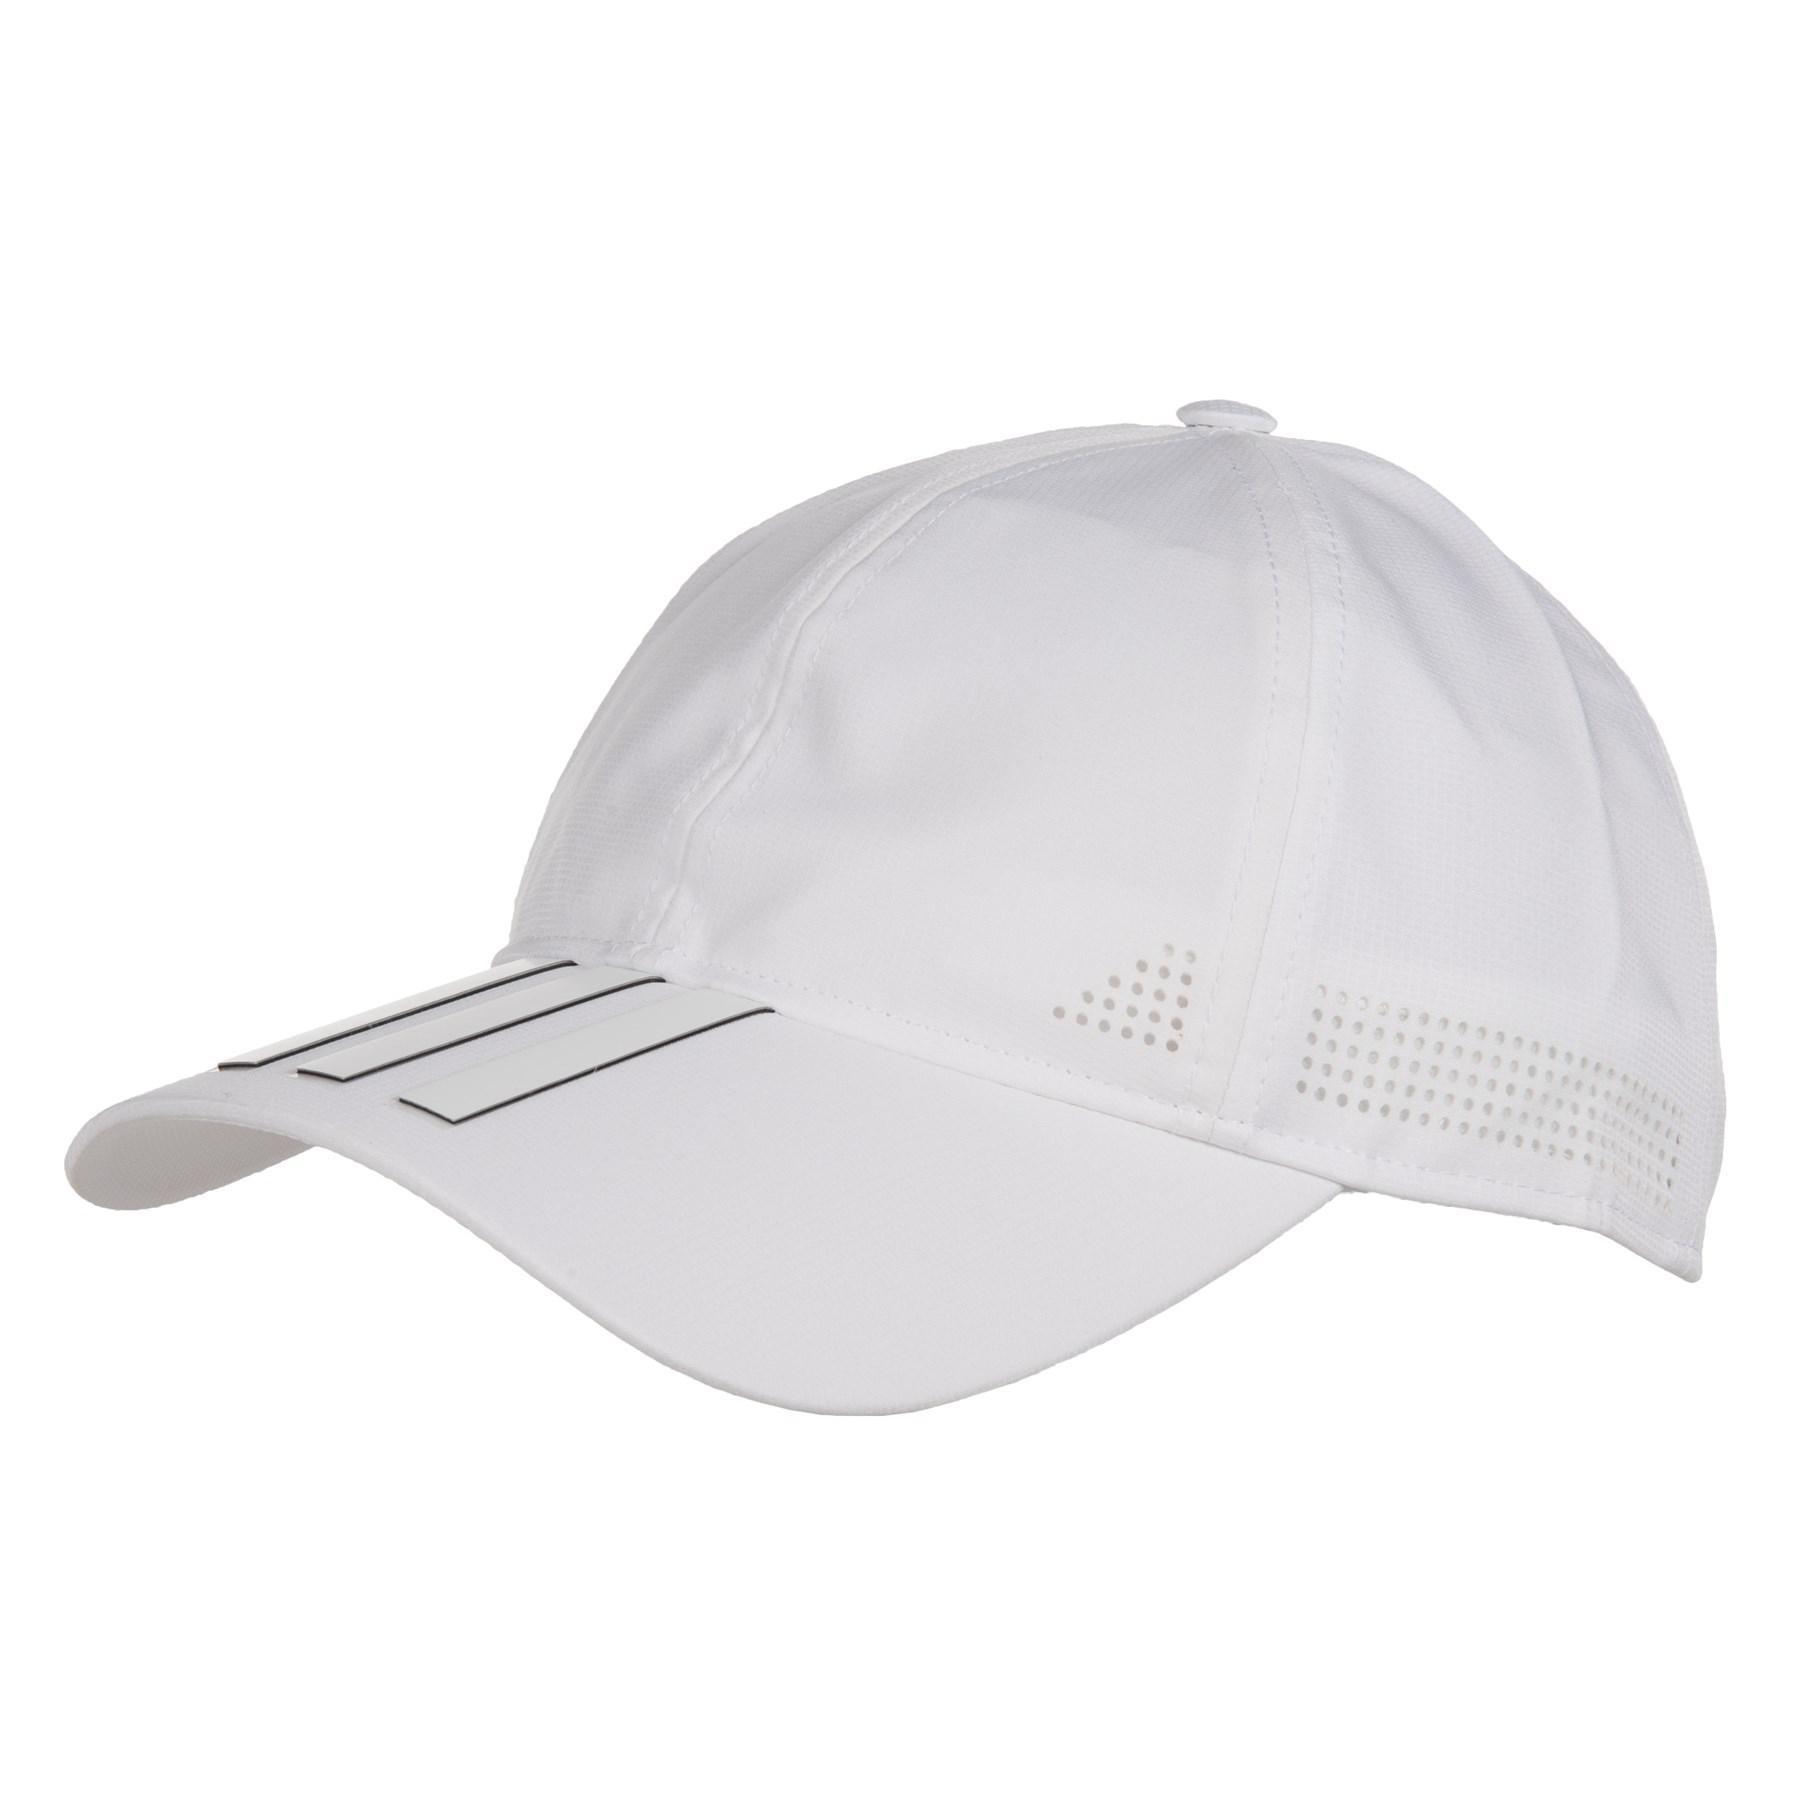 14a6e4cf18f480 adidas 6-panel 3-stripe Climate Control Baseball Cap in White - Lyst